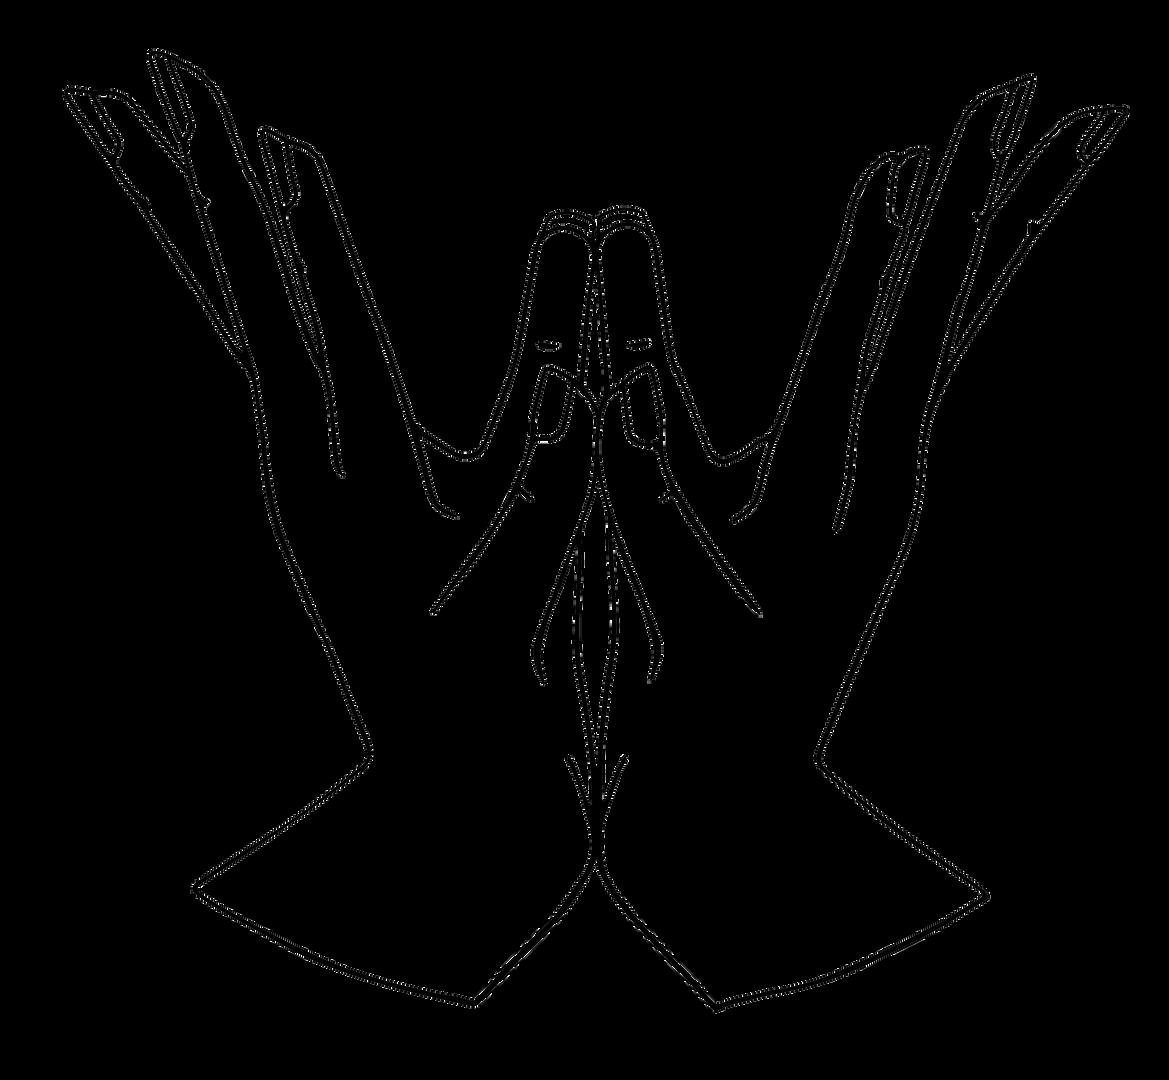 Padma (Lotus) Yoga Mudra Line Art